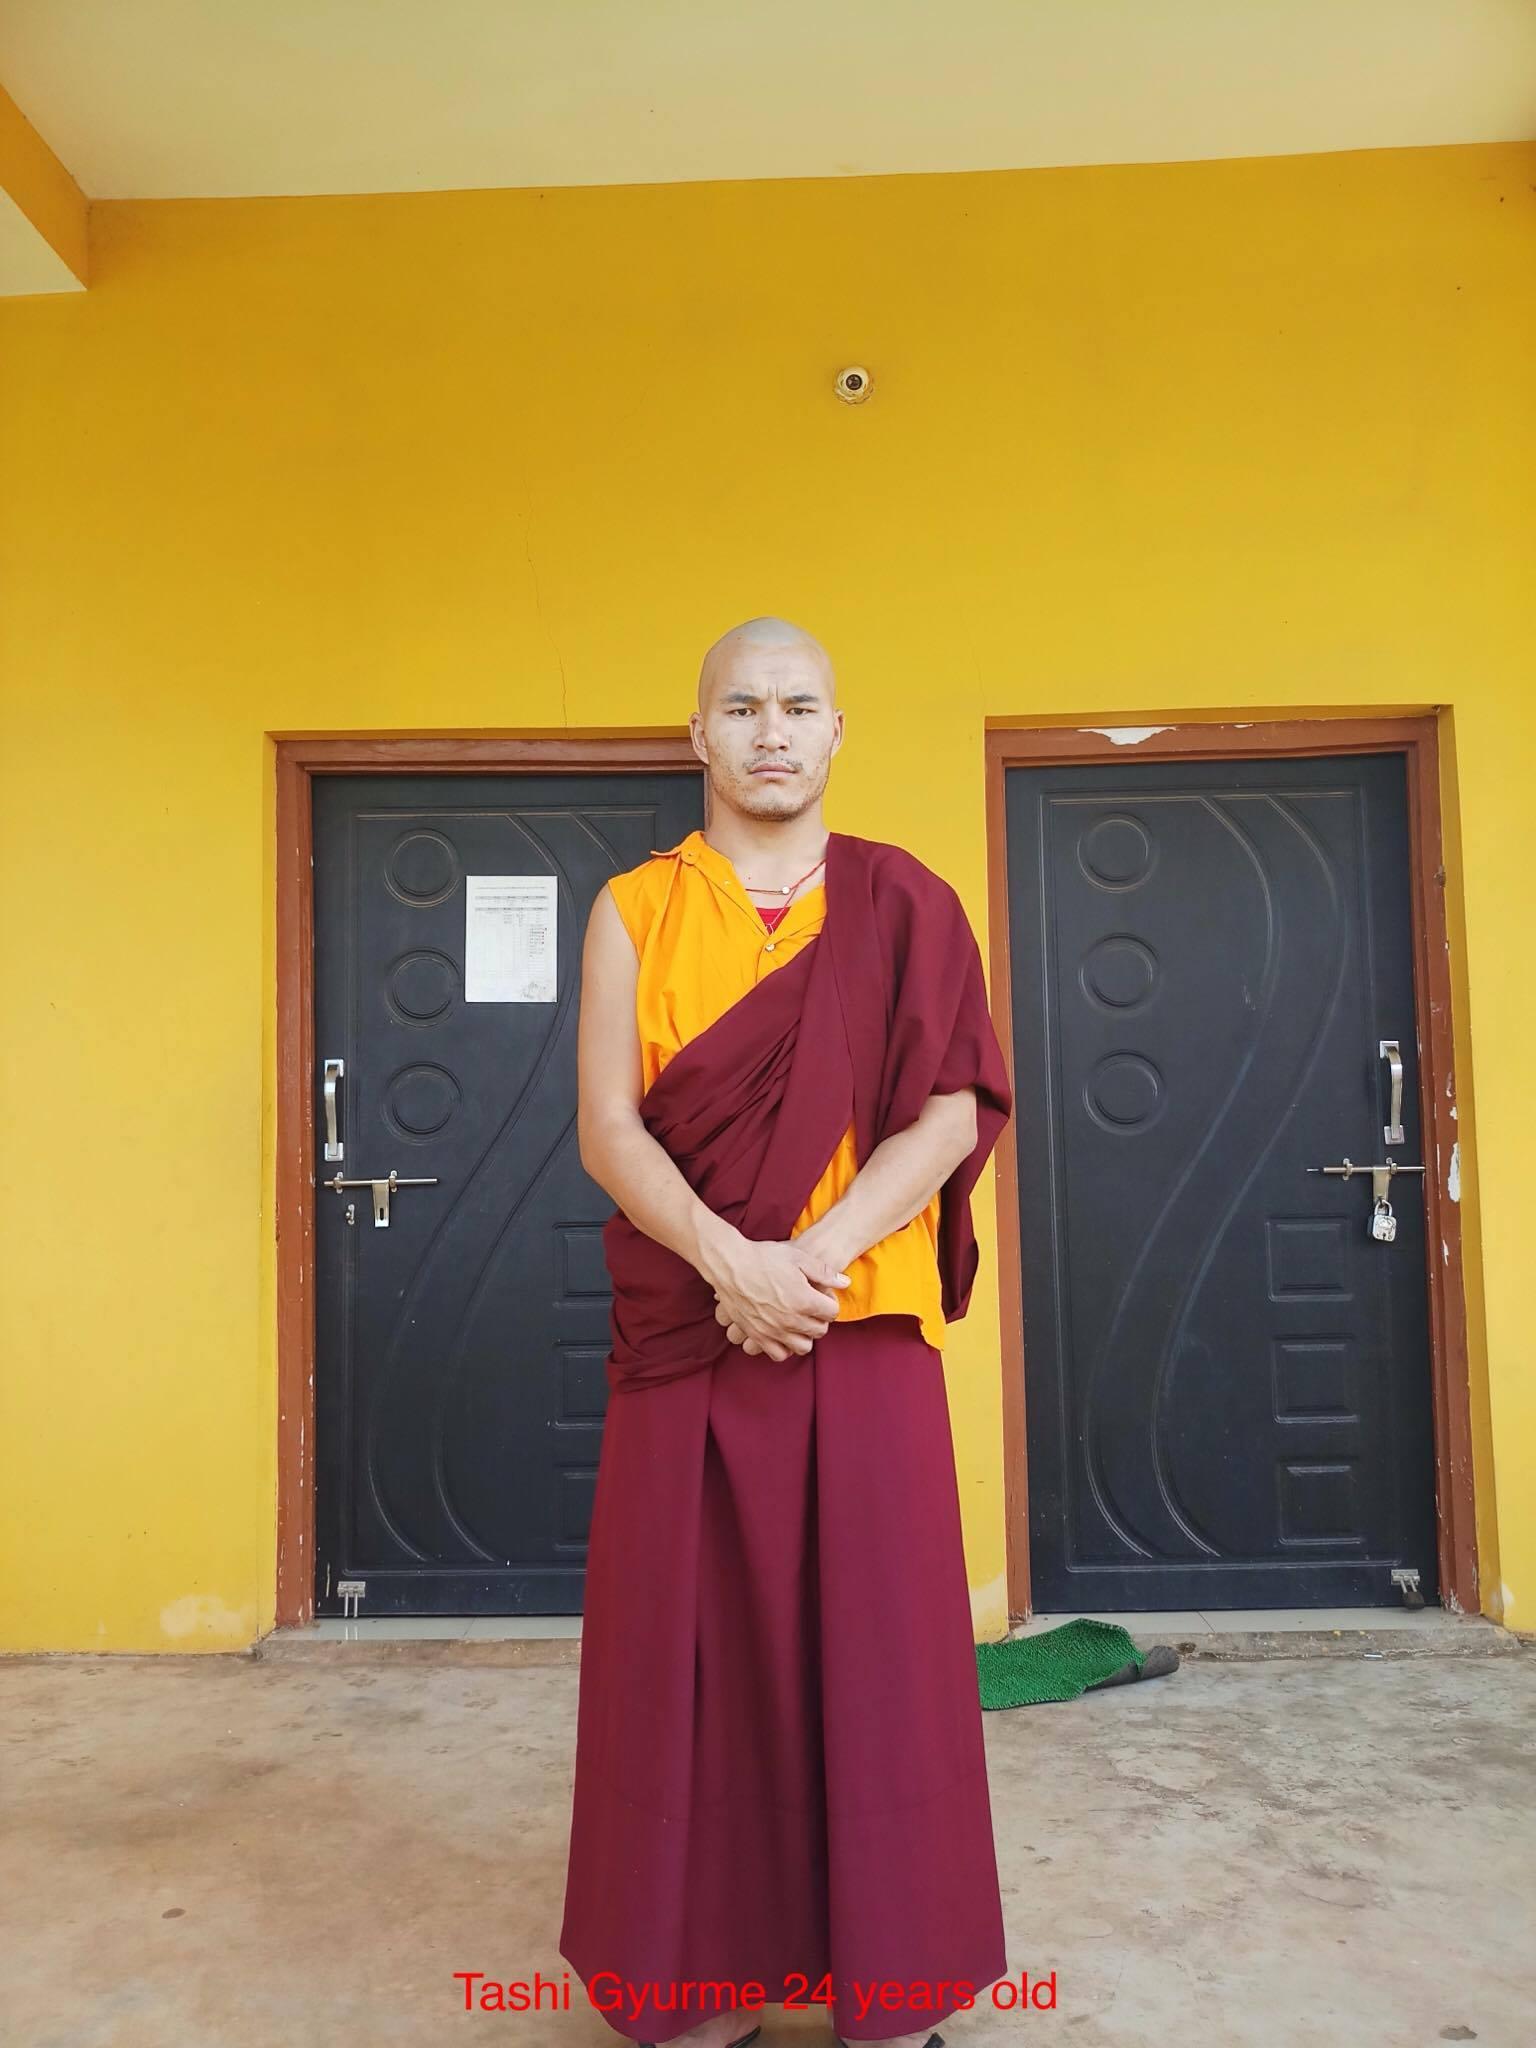 Monks_Tashi_Gyurme_24yrs_old.jpg